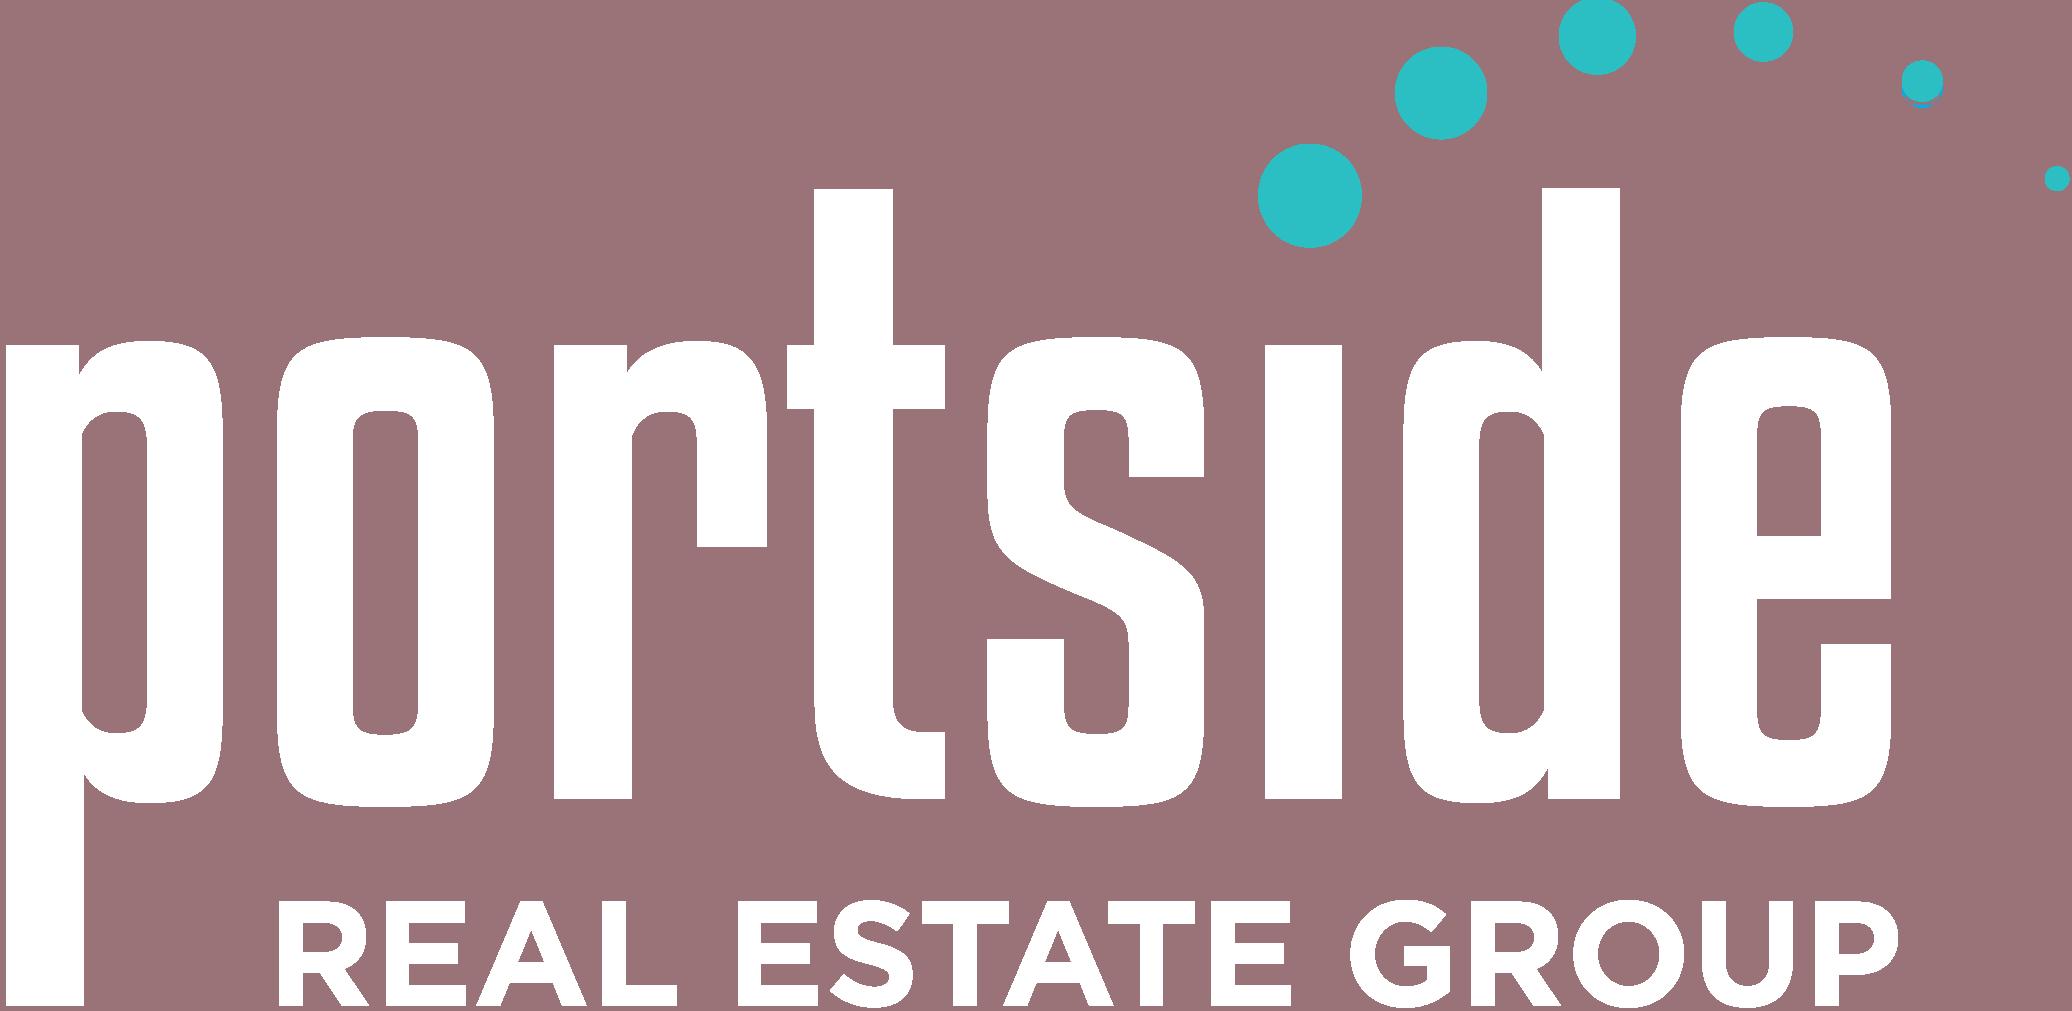 Portside Real Estate Group company logo